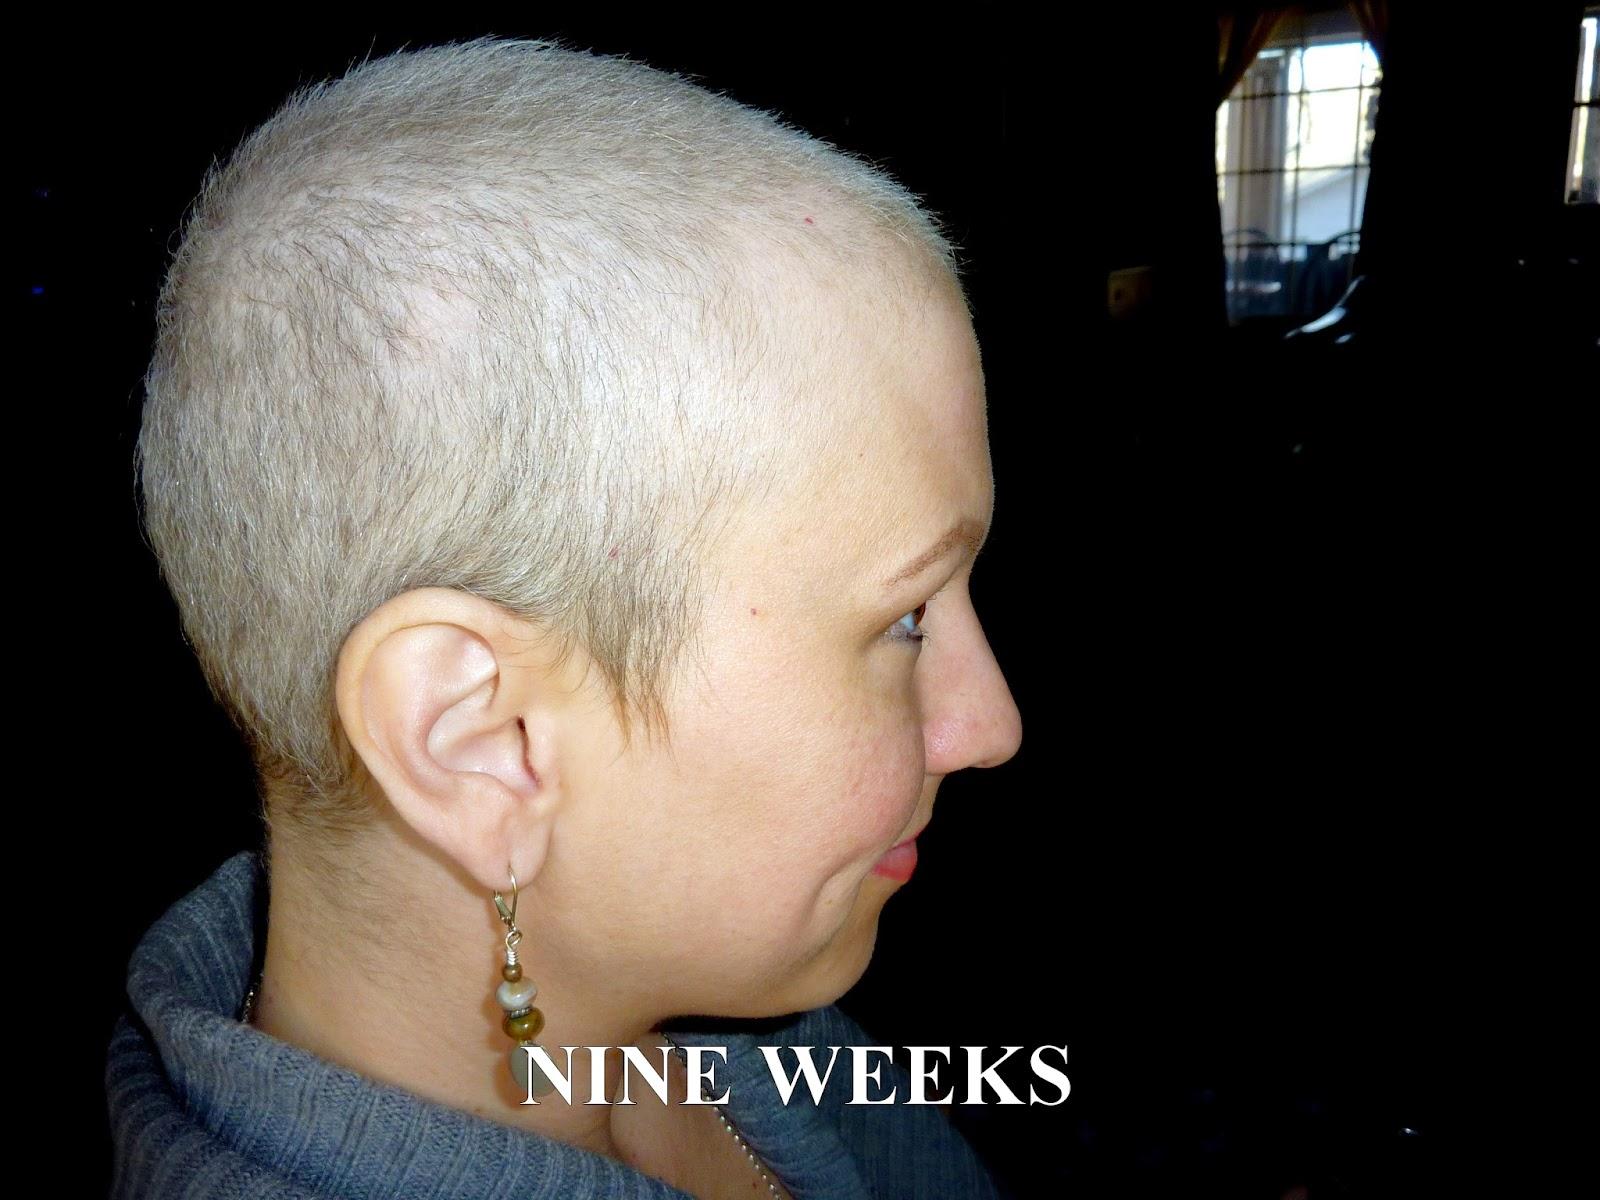 Biotin Hair Growth: Biotin Hair Growth After Chemo